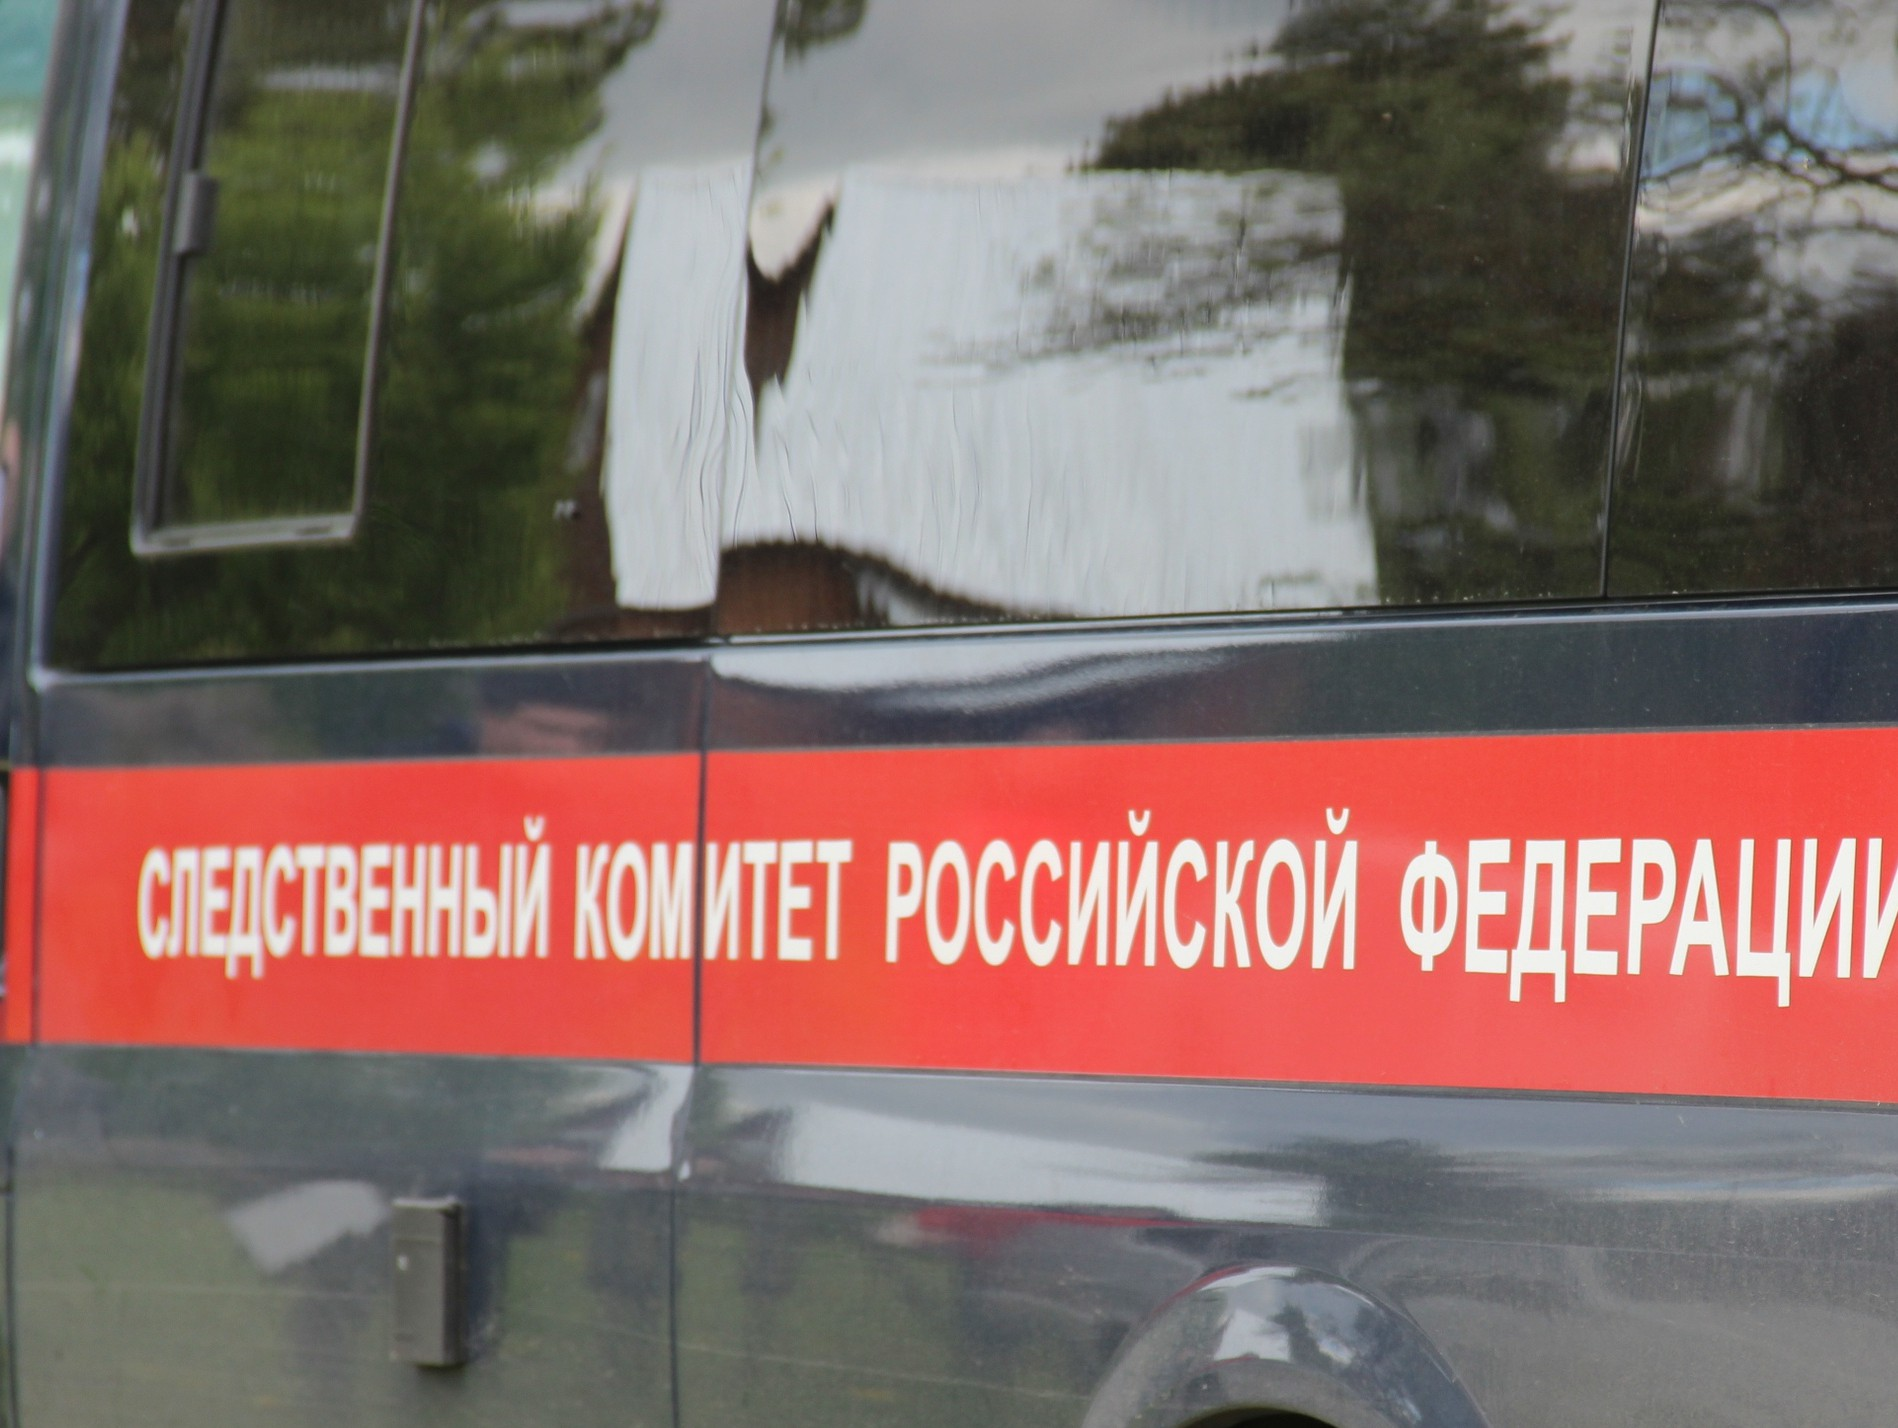 Exstazy Продажа Москва Меф Куплю Сергиев Посад